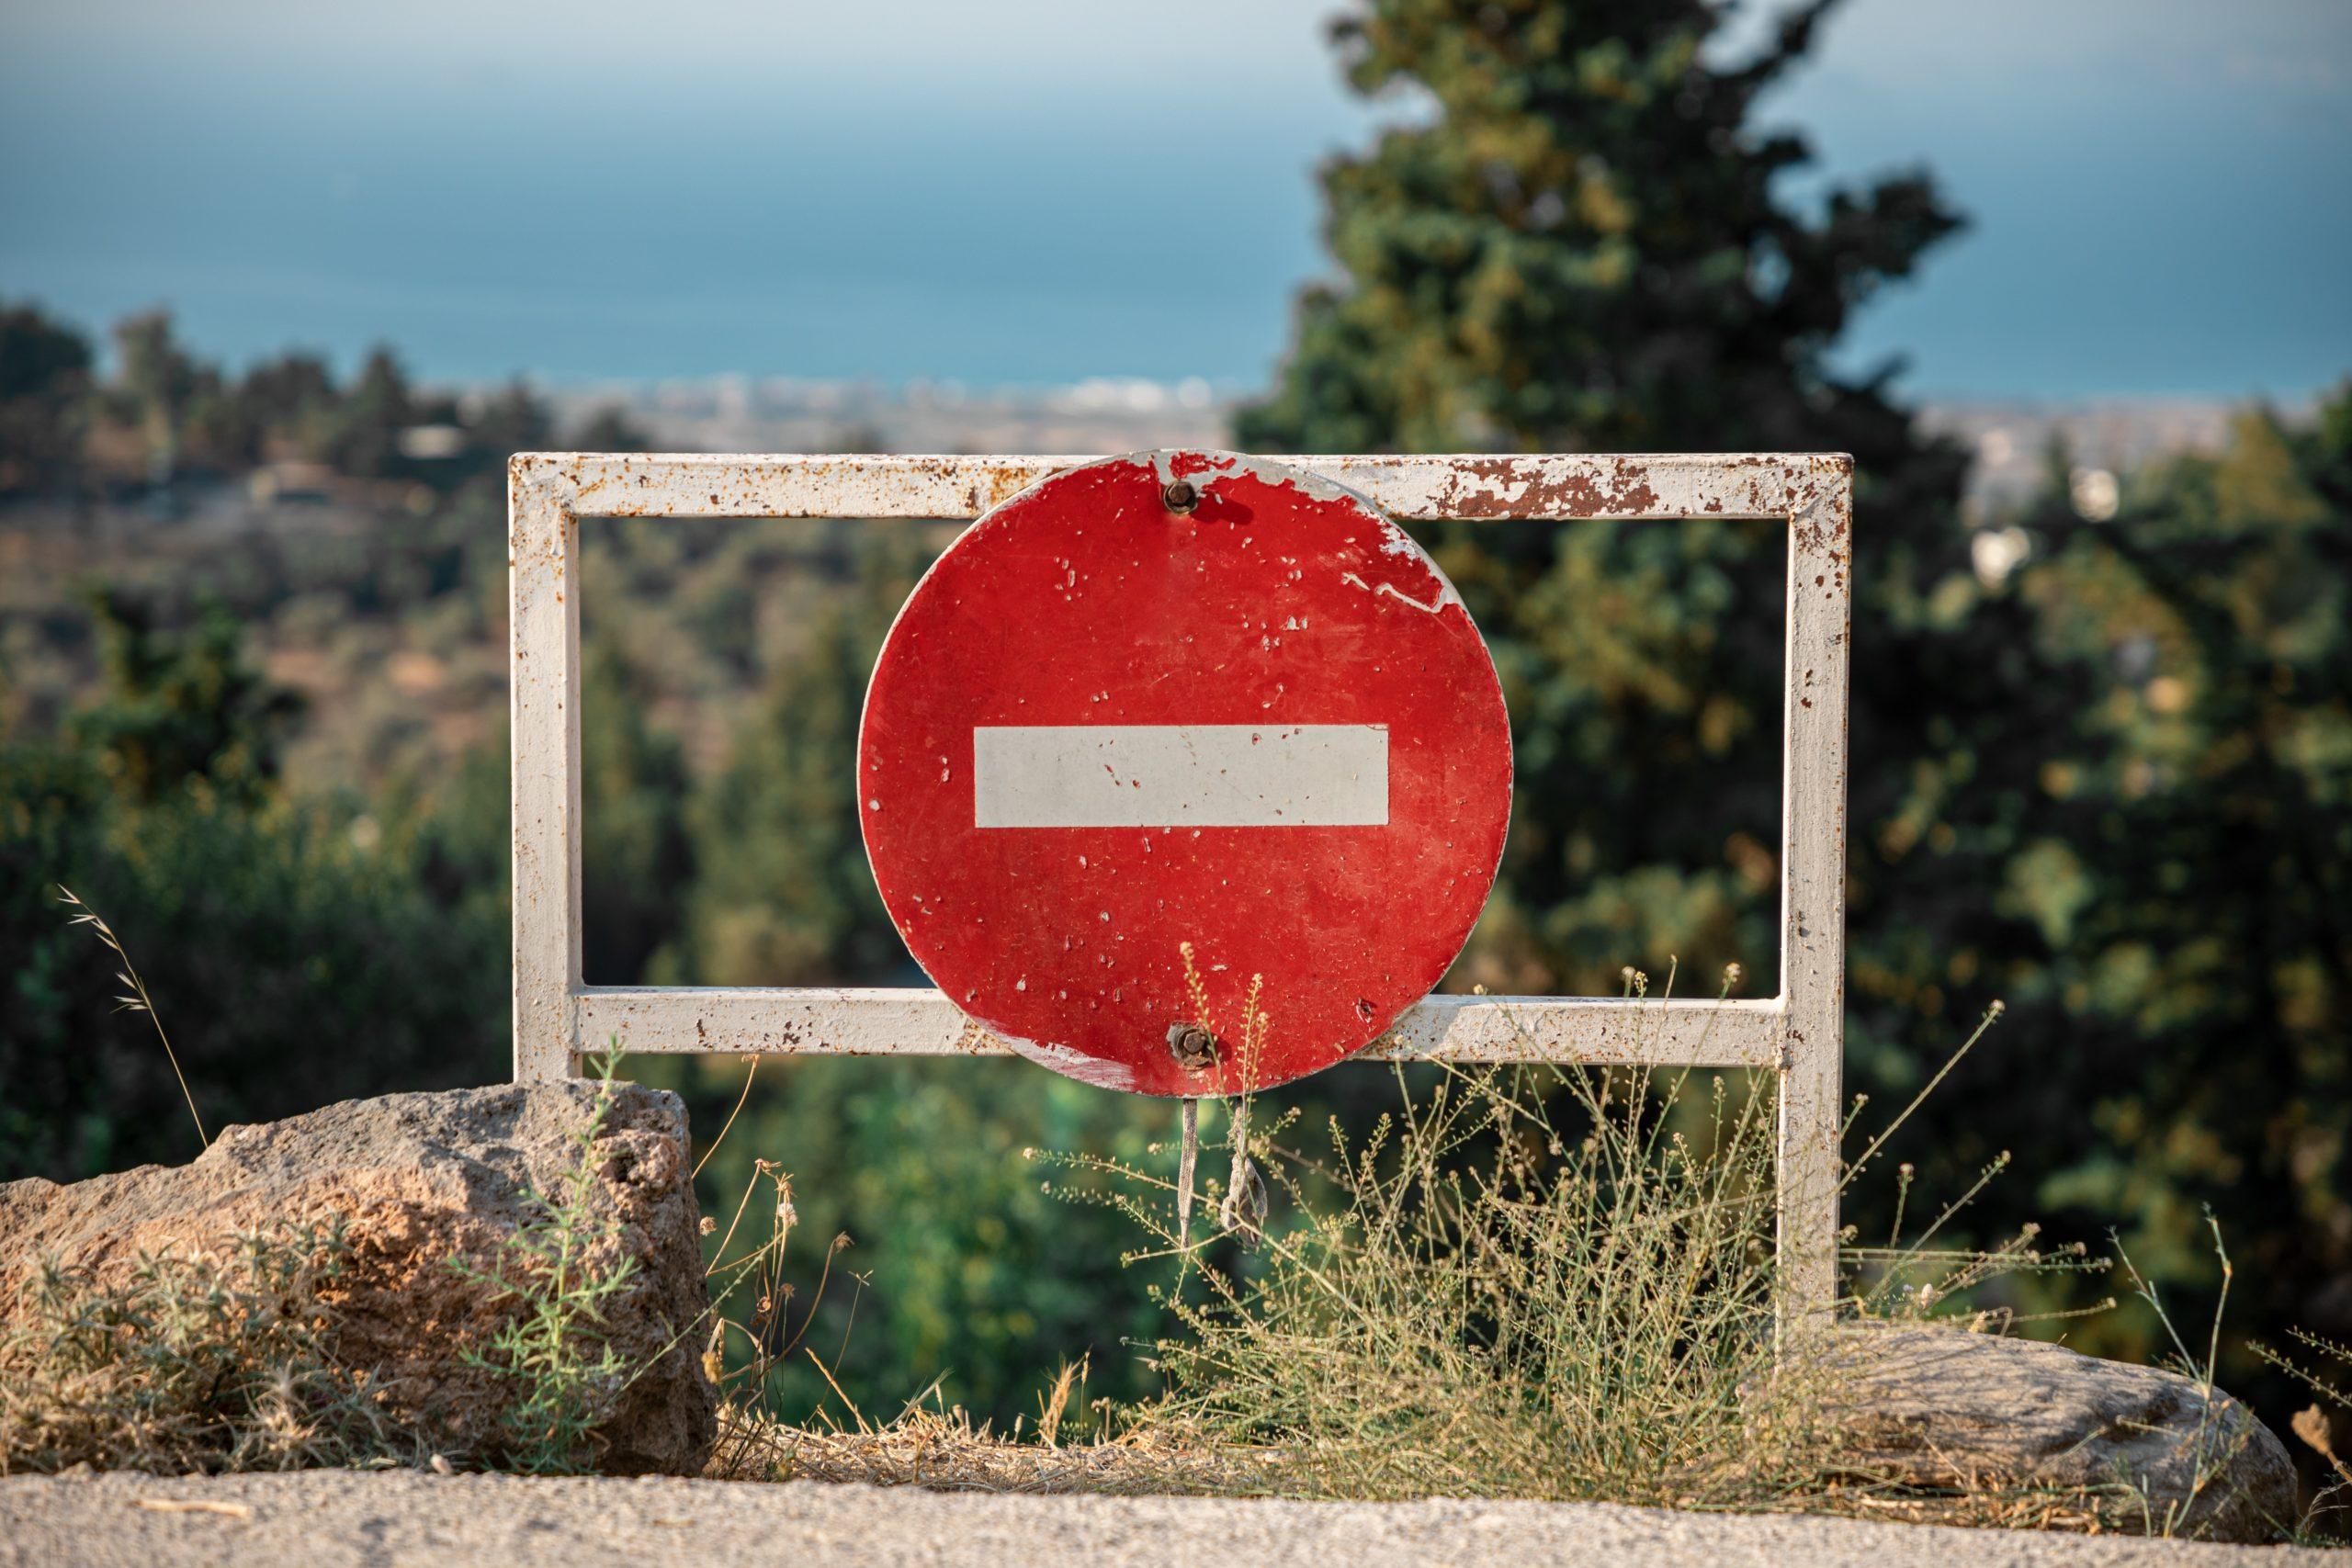 Coronavirus : Entrainements toujours suspendus